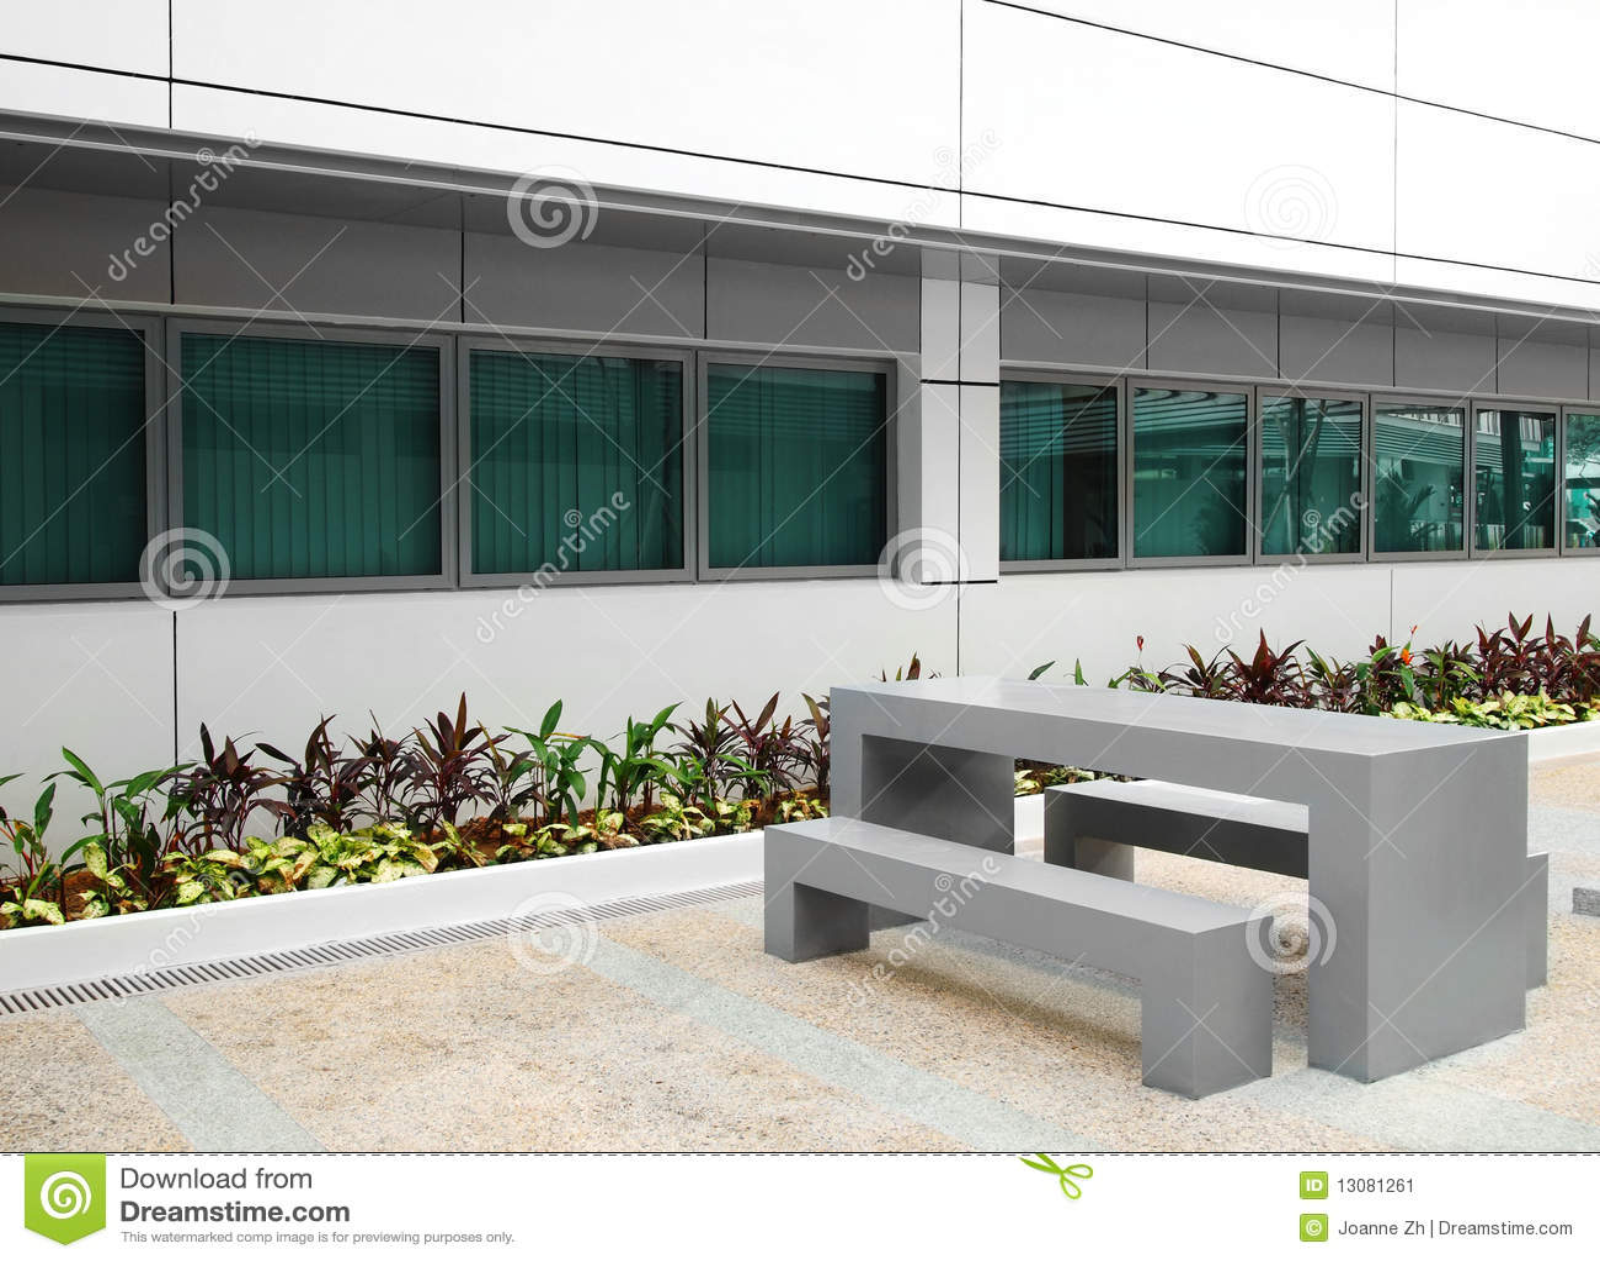 office building courtyard garden furniture building office furniture